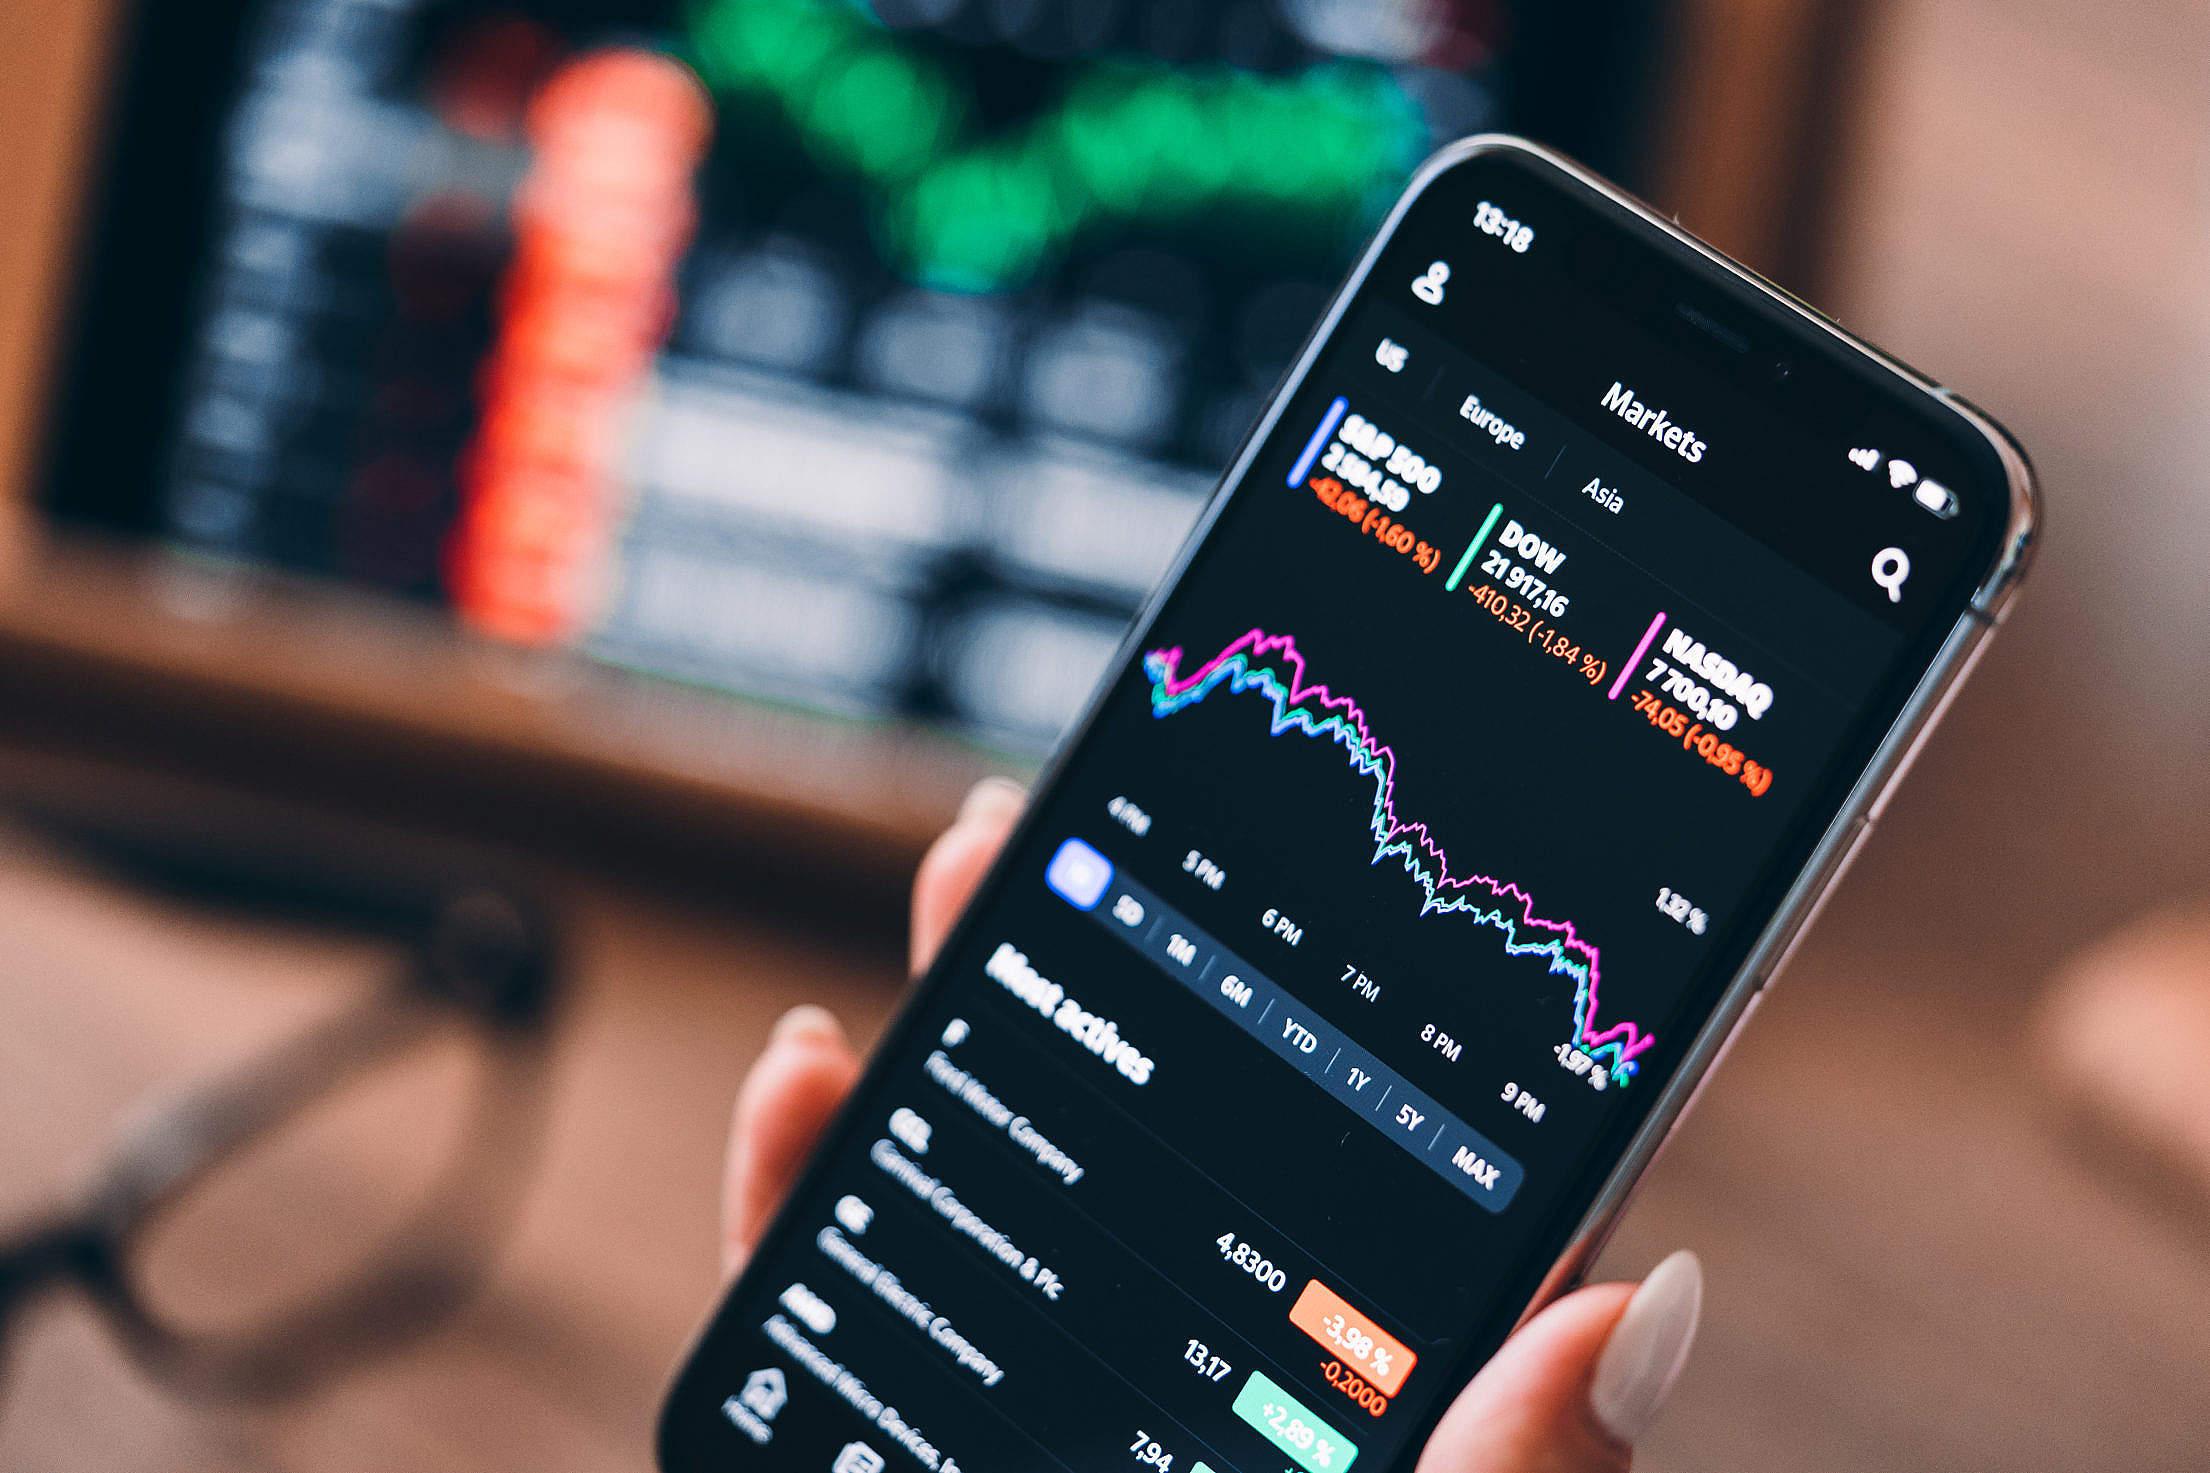 Checking Stock Market Data on Smartphone Free Stock Photo